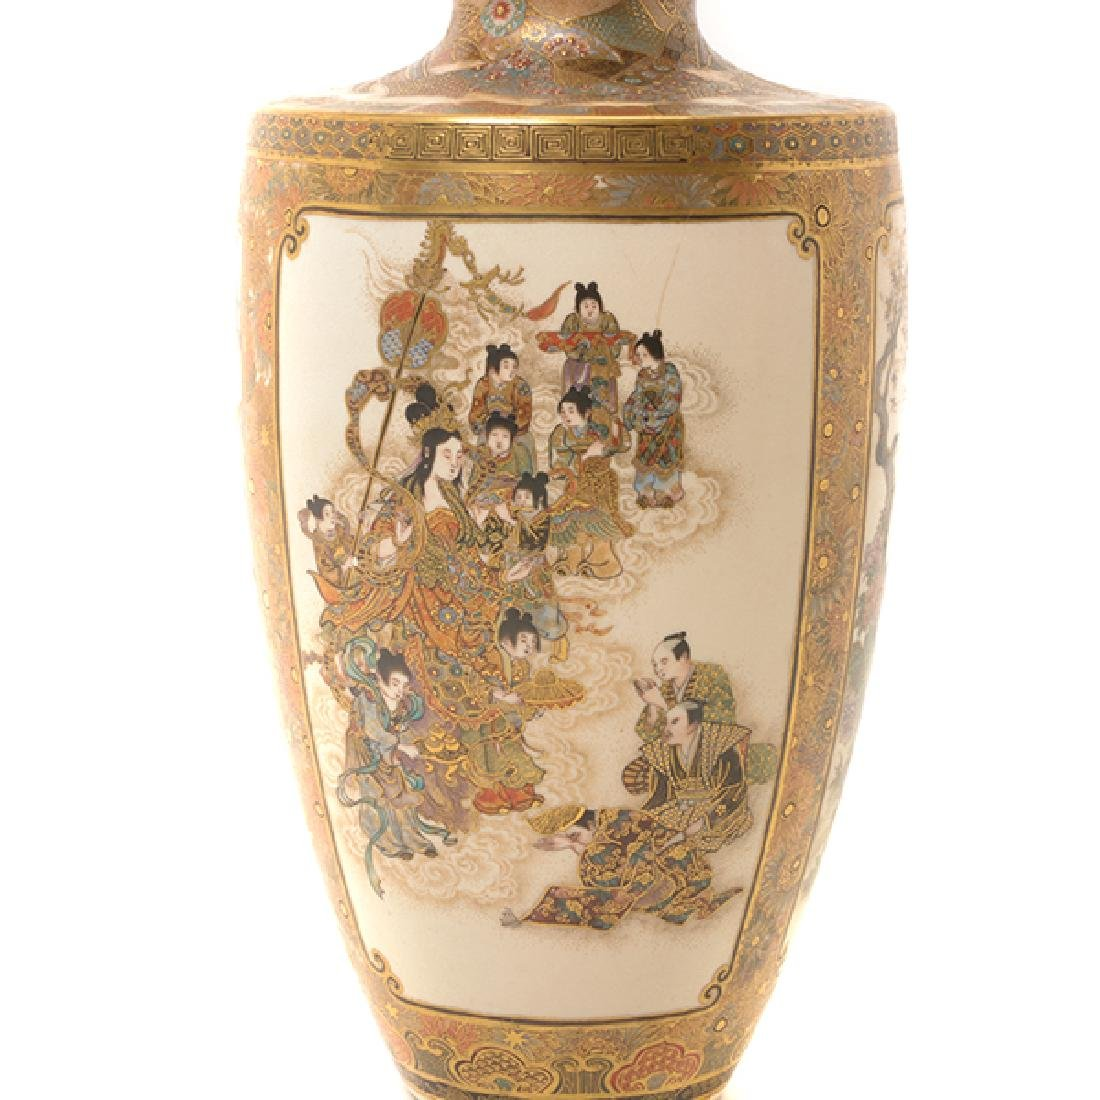 A Pair of Satsuma Vases By Okamoto Ryozan, Meiji Period - 6